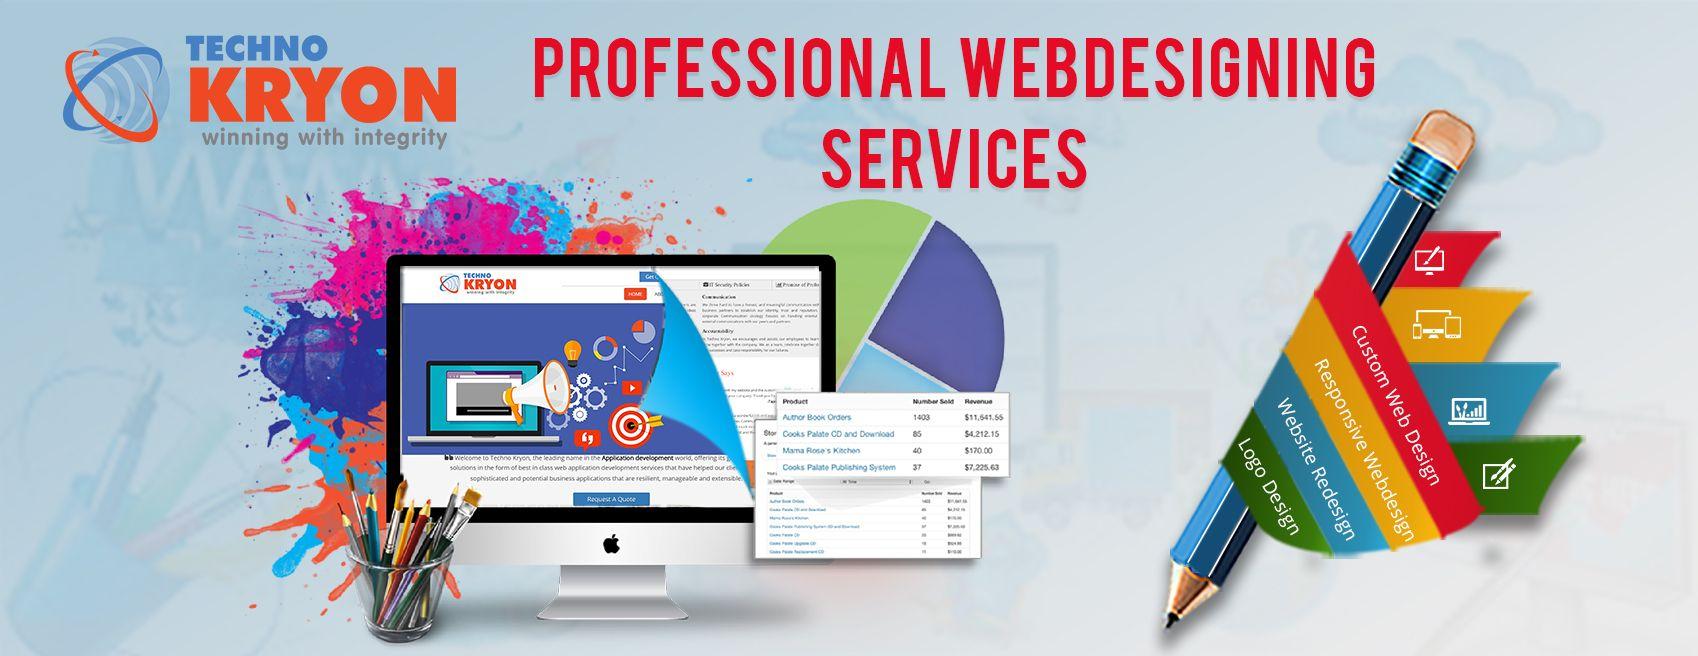 Techno Kryon Custom Web Design Developers Chennai Custom Web Design Services India Custom Web Designing Web Design Web Development Design Custom Web Design